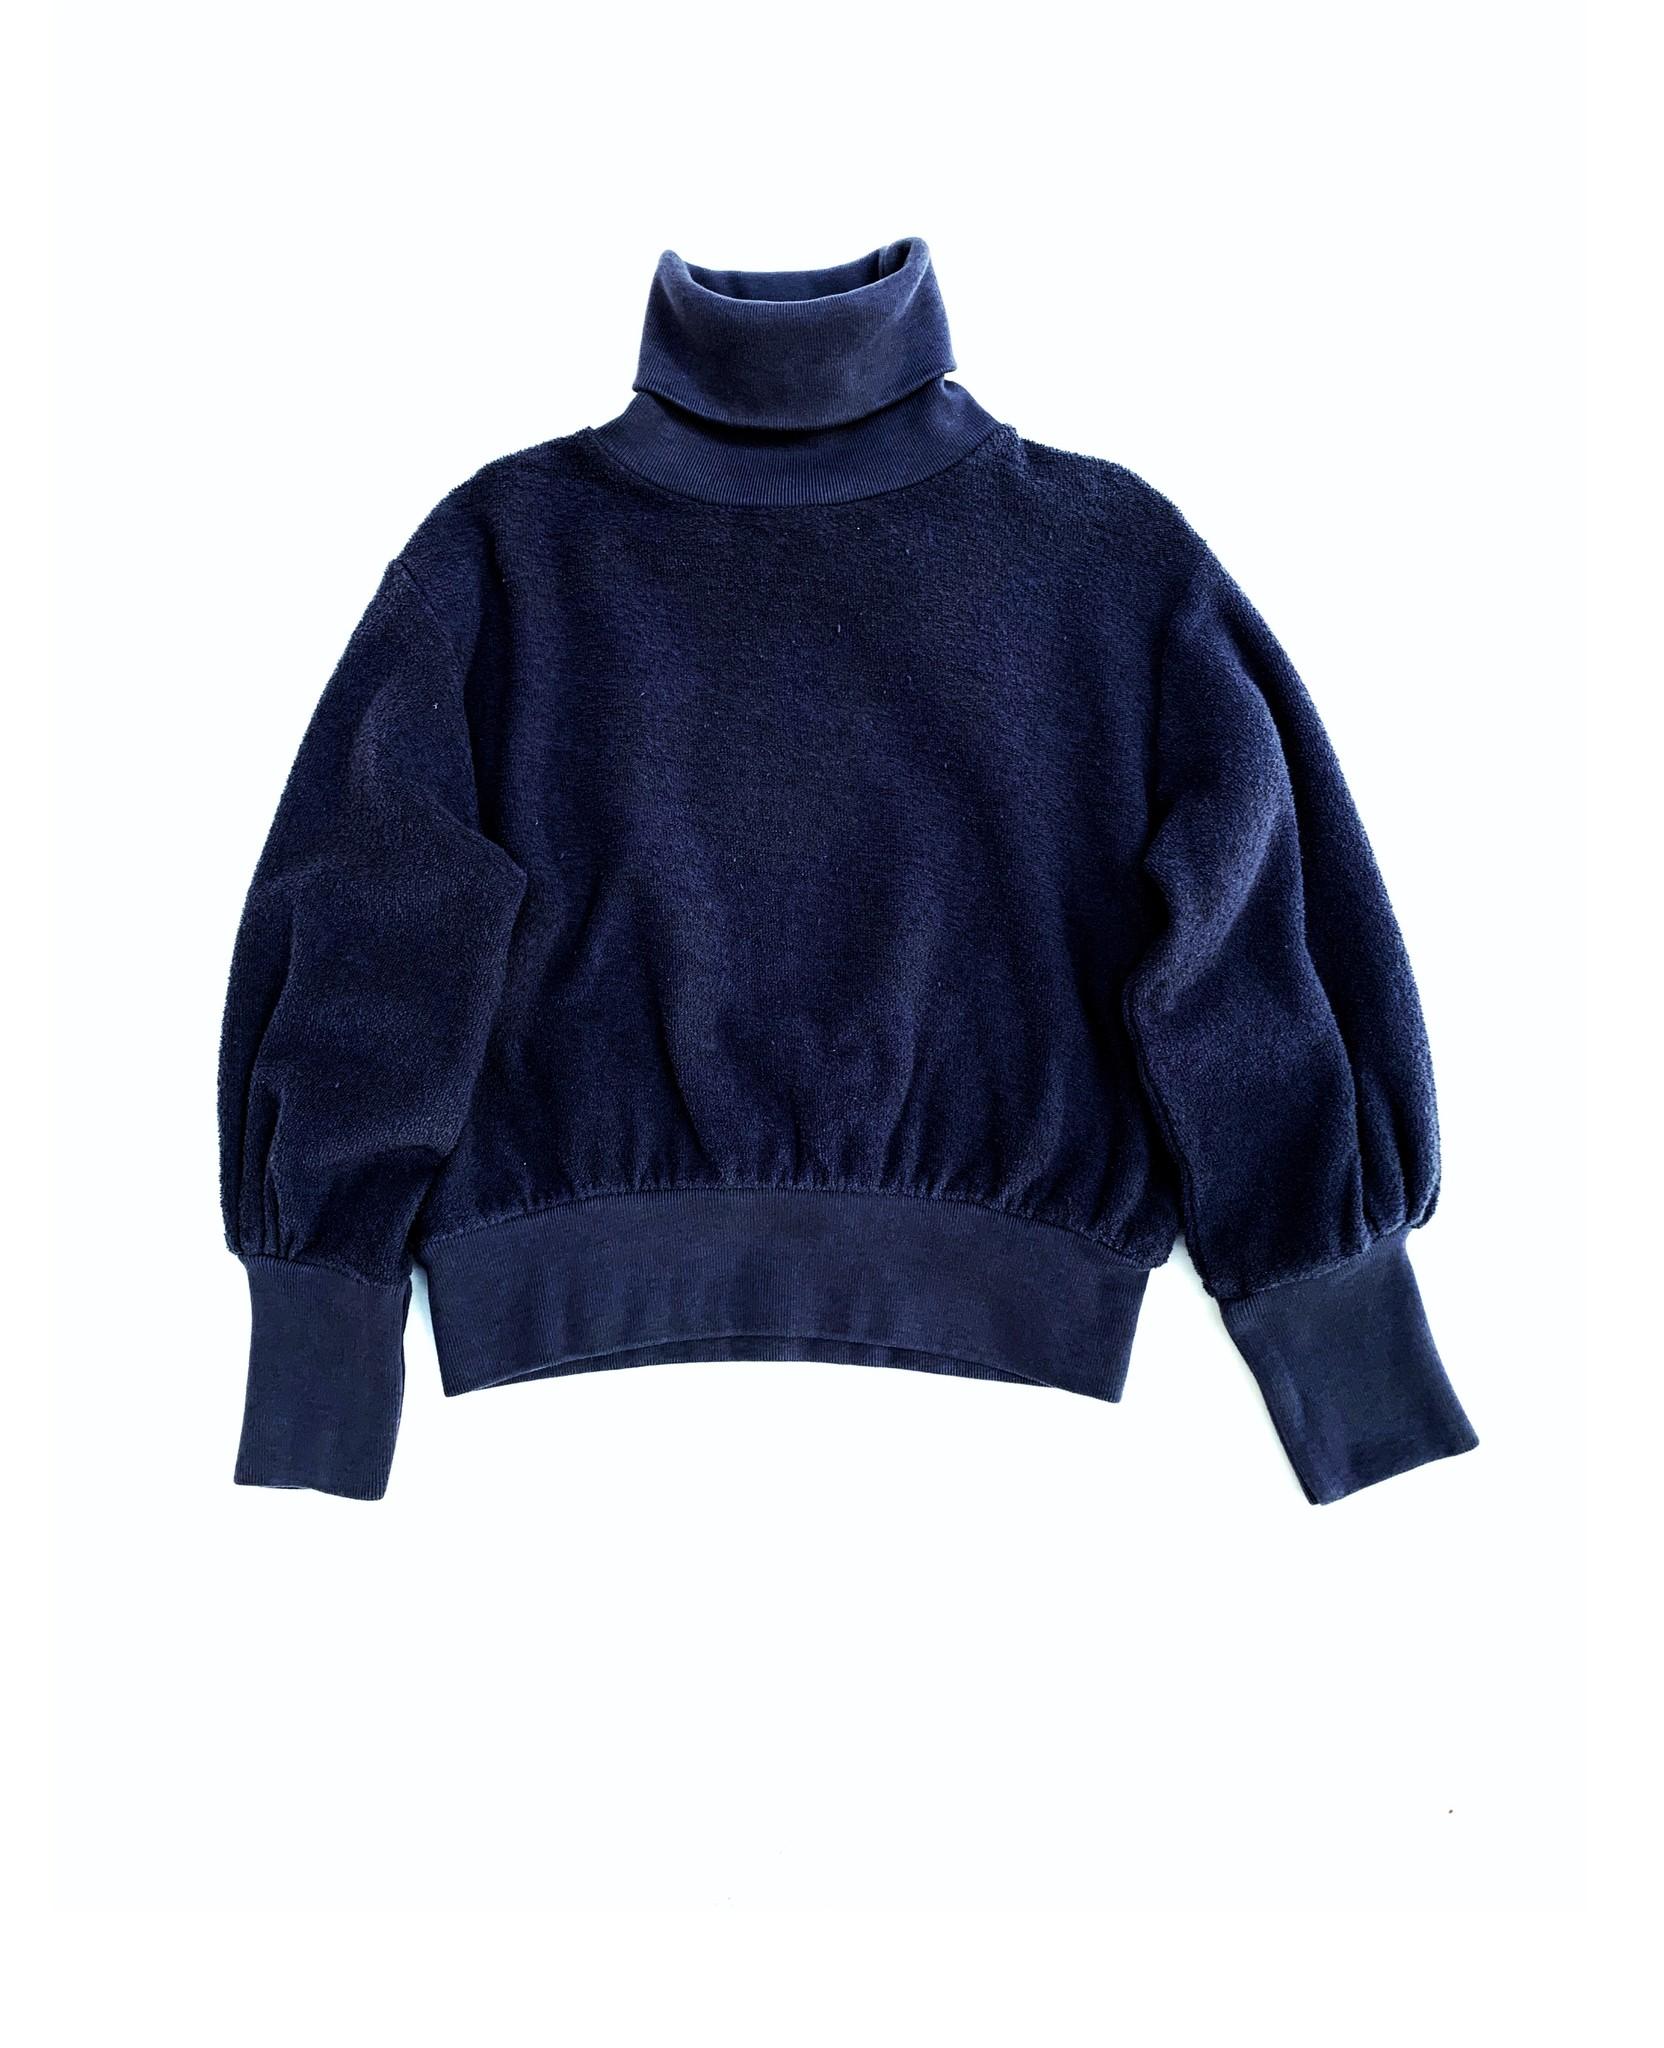 Terry collsweater - Navy-1